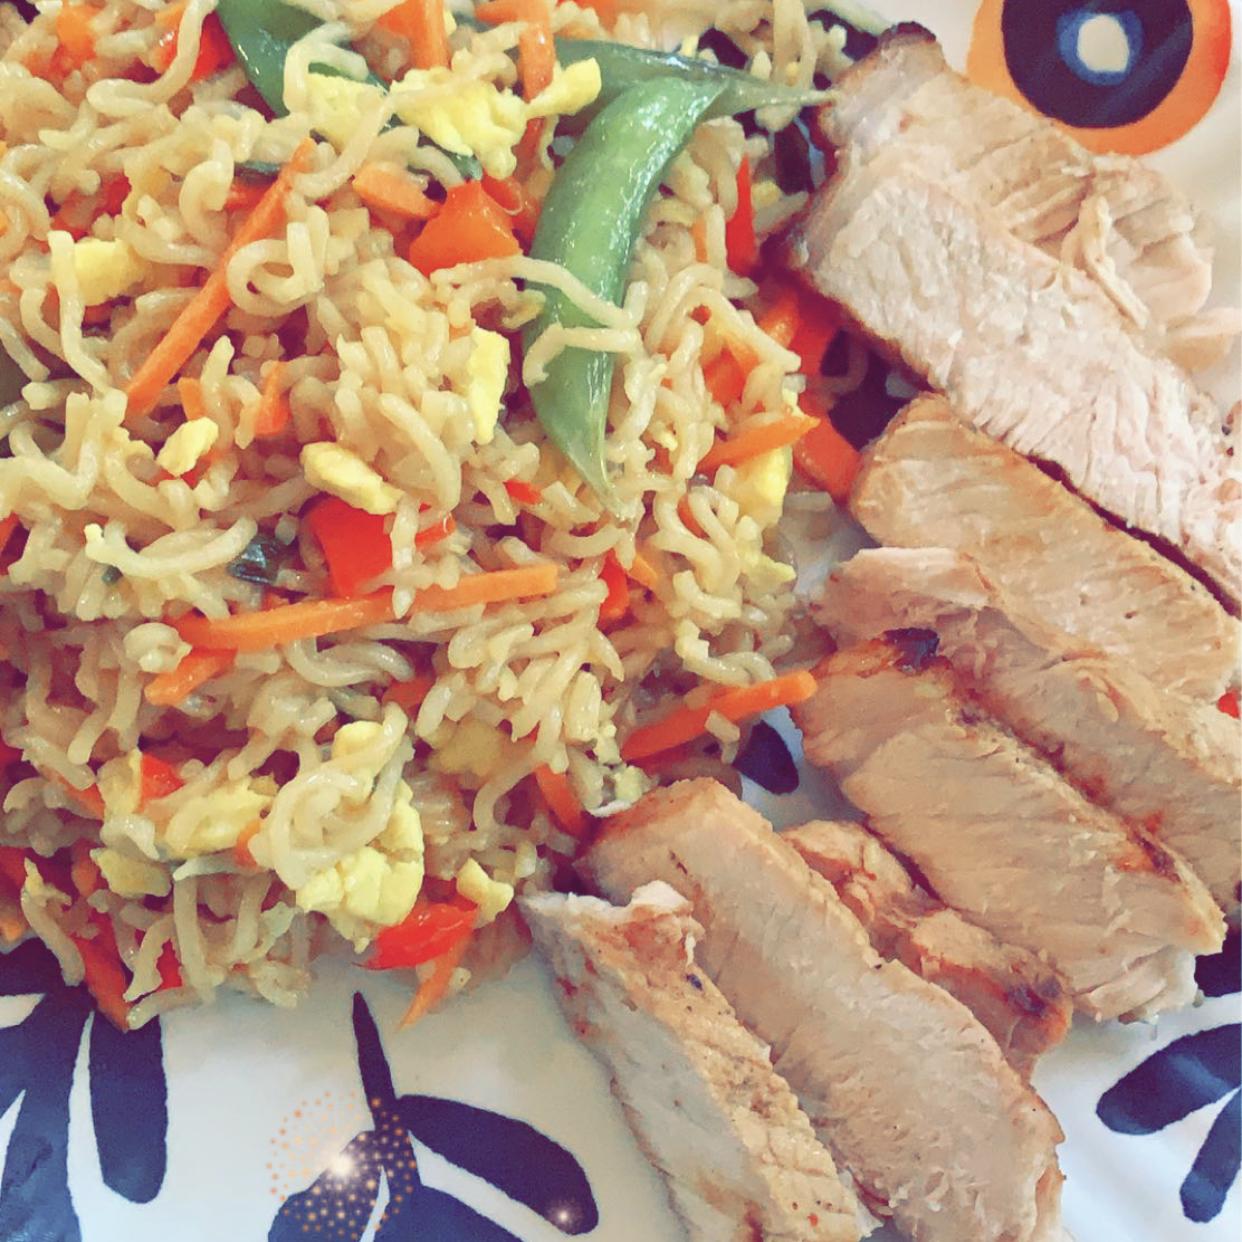 Grilled Pork Loin Chops